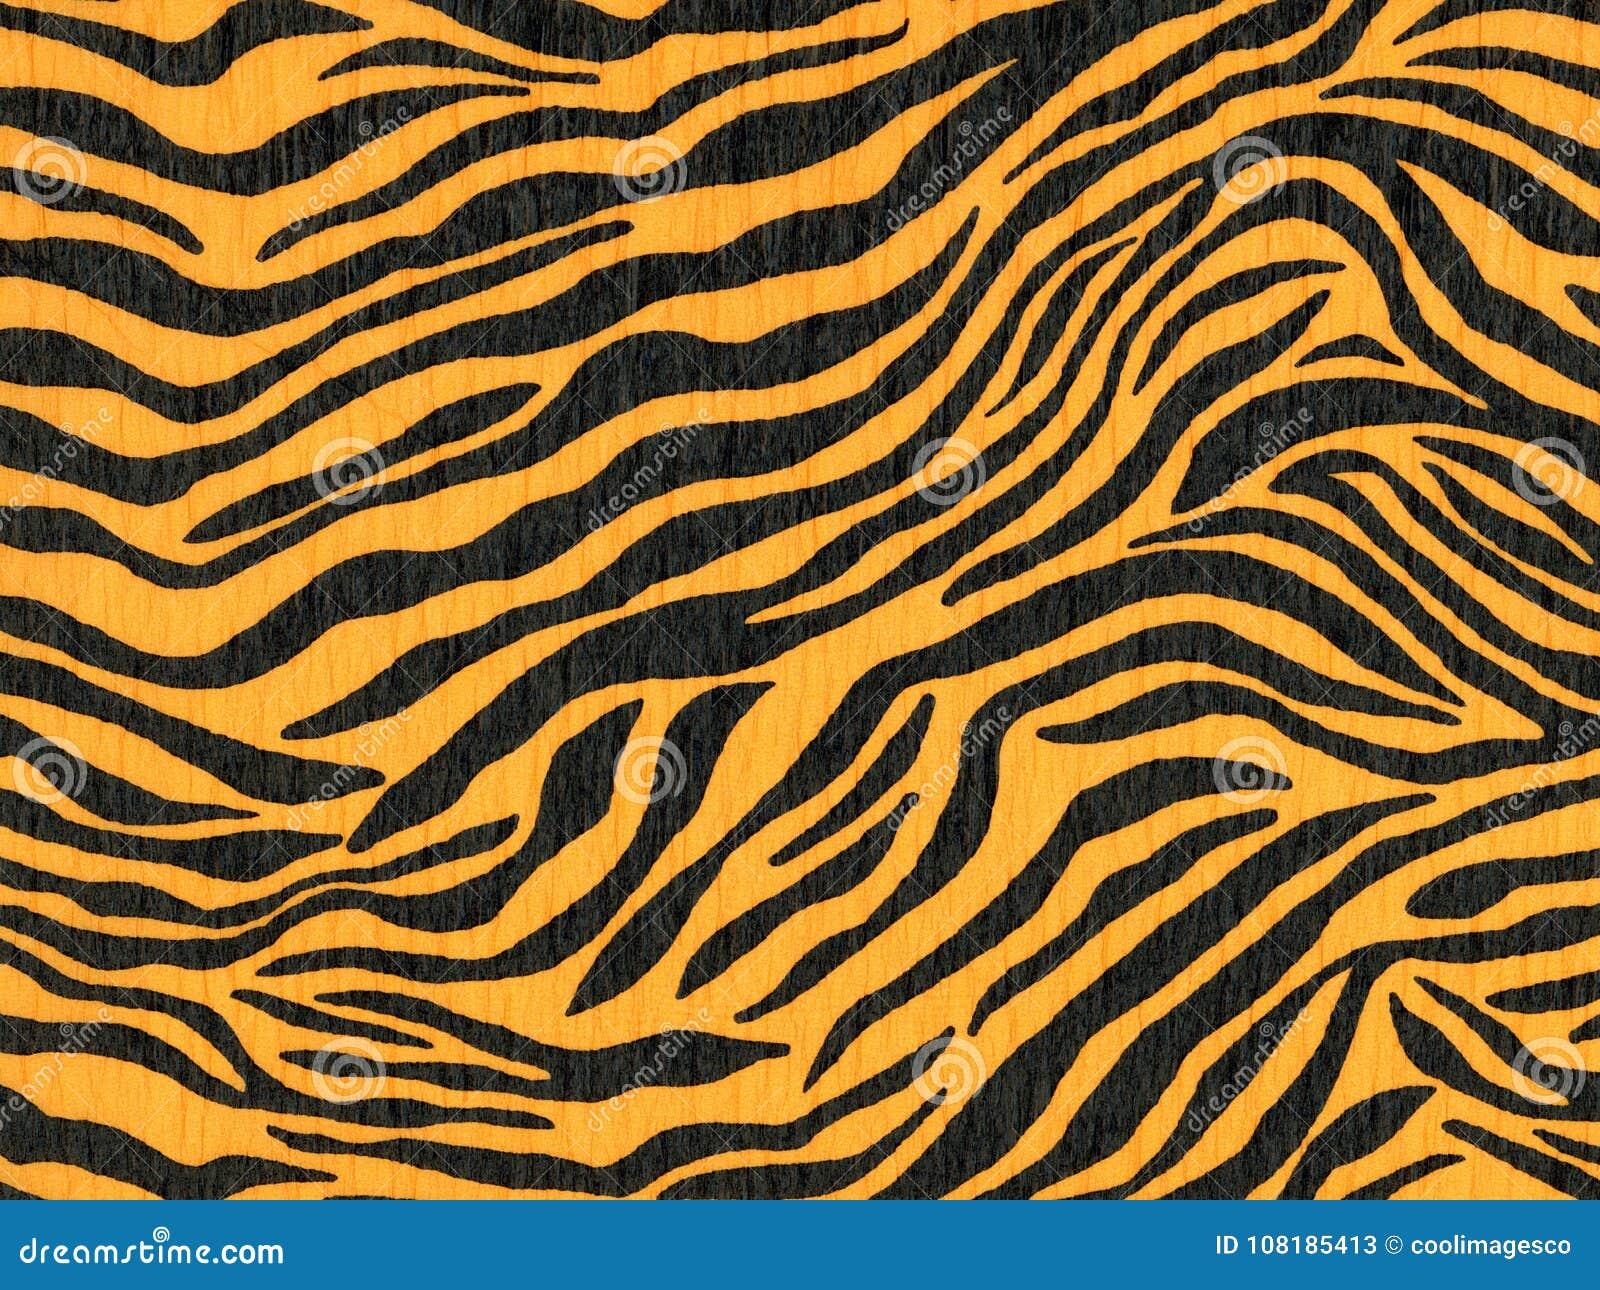 Crepe Paper That Has A Leopard Or Jaguar Pattern For Wallpaper Or